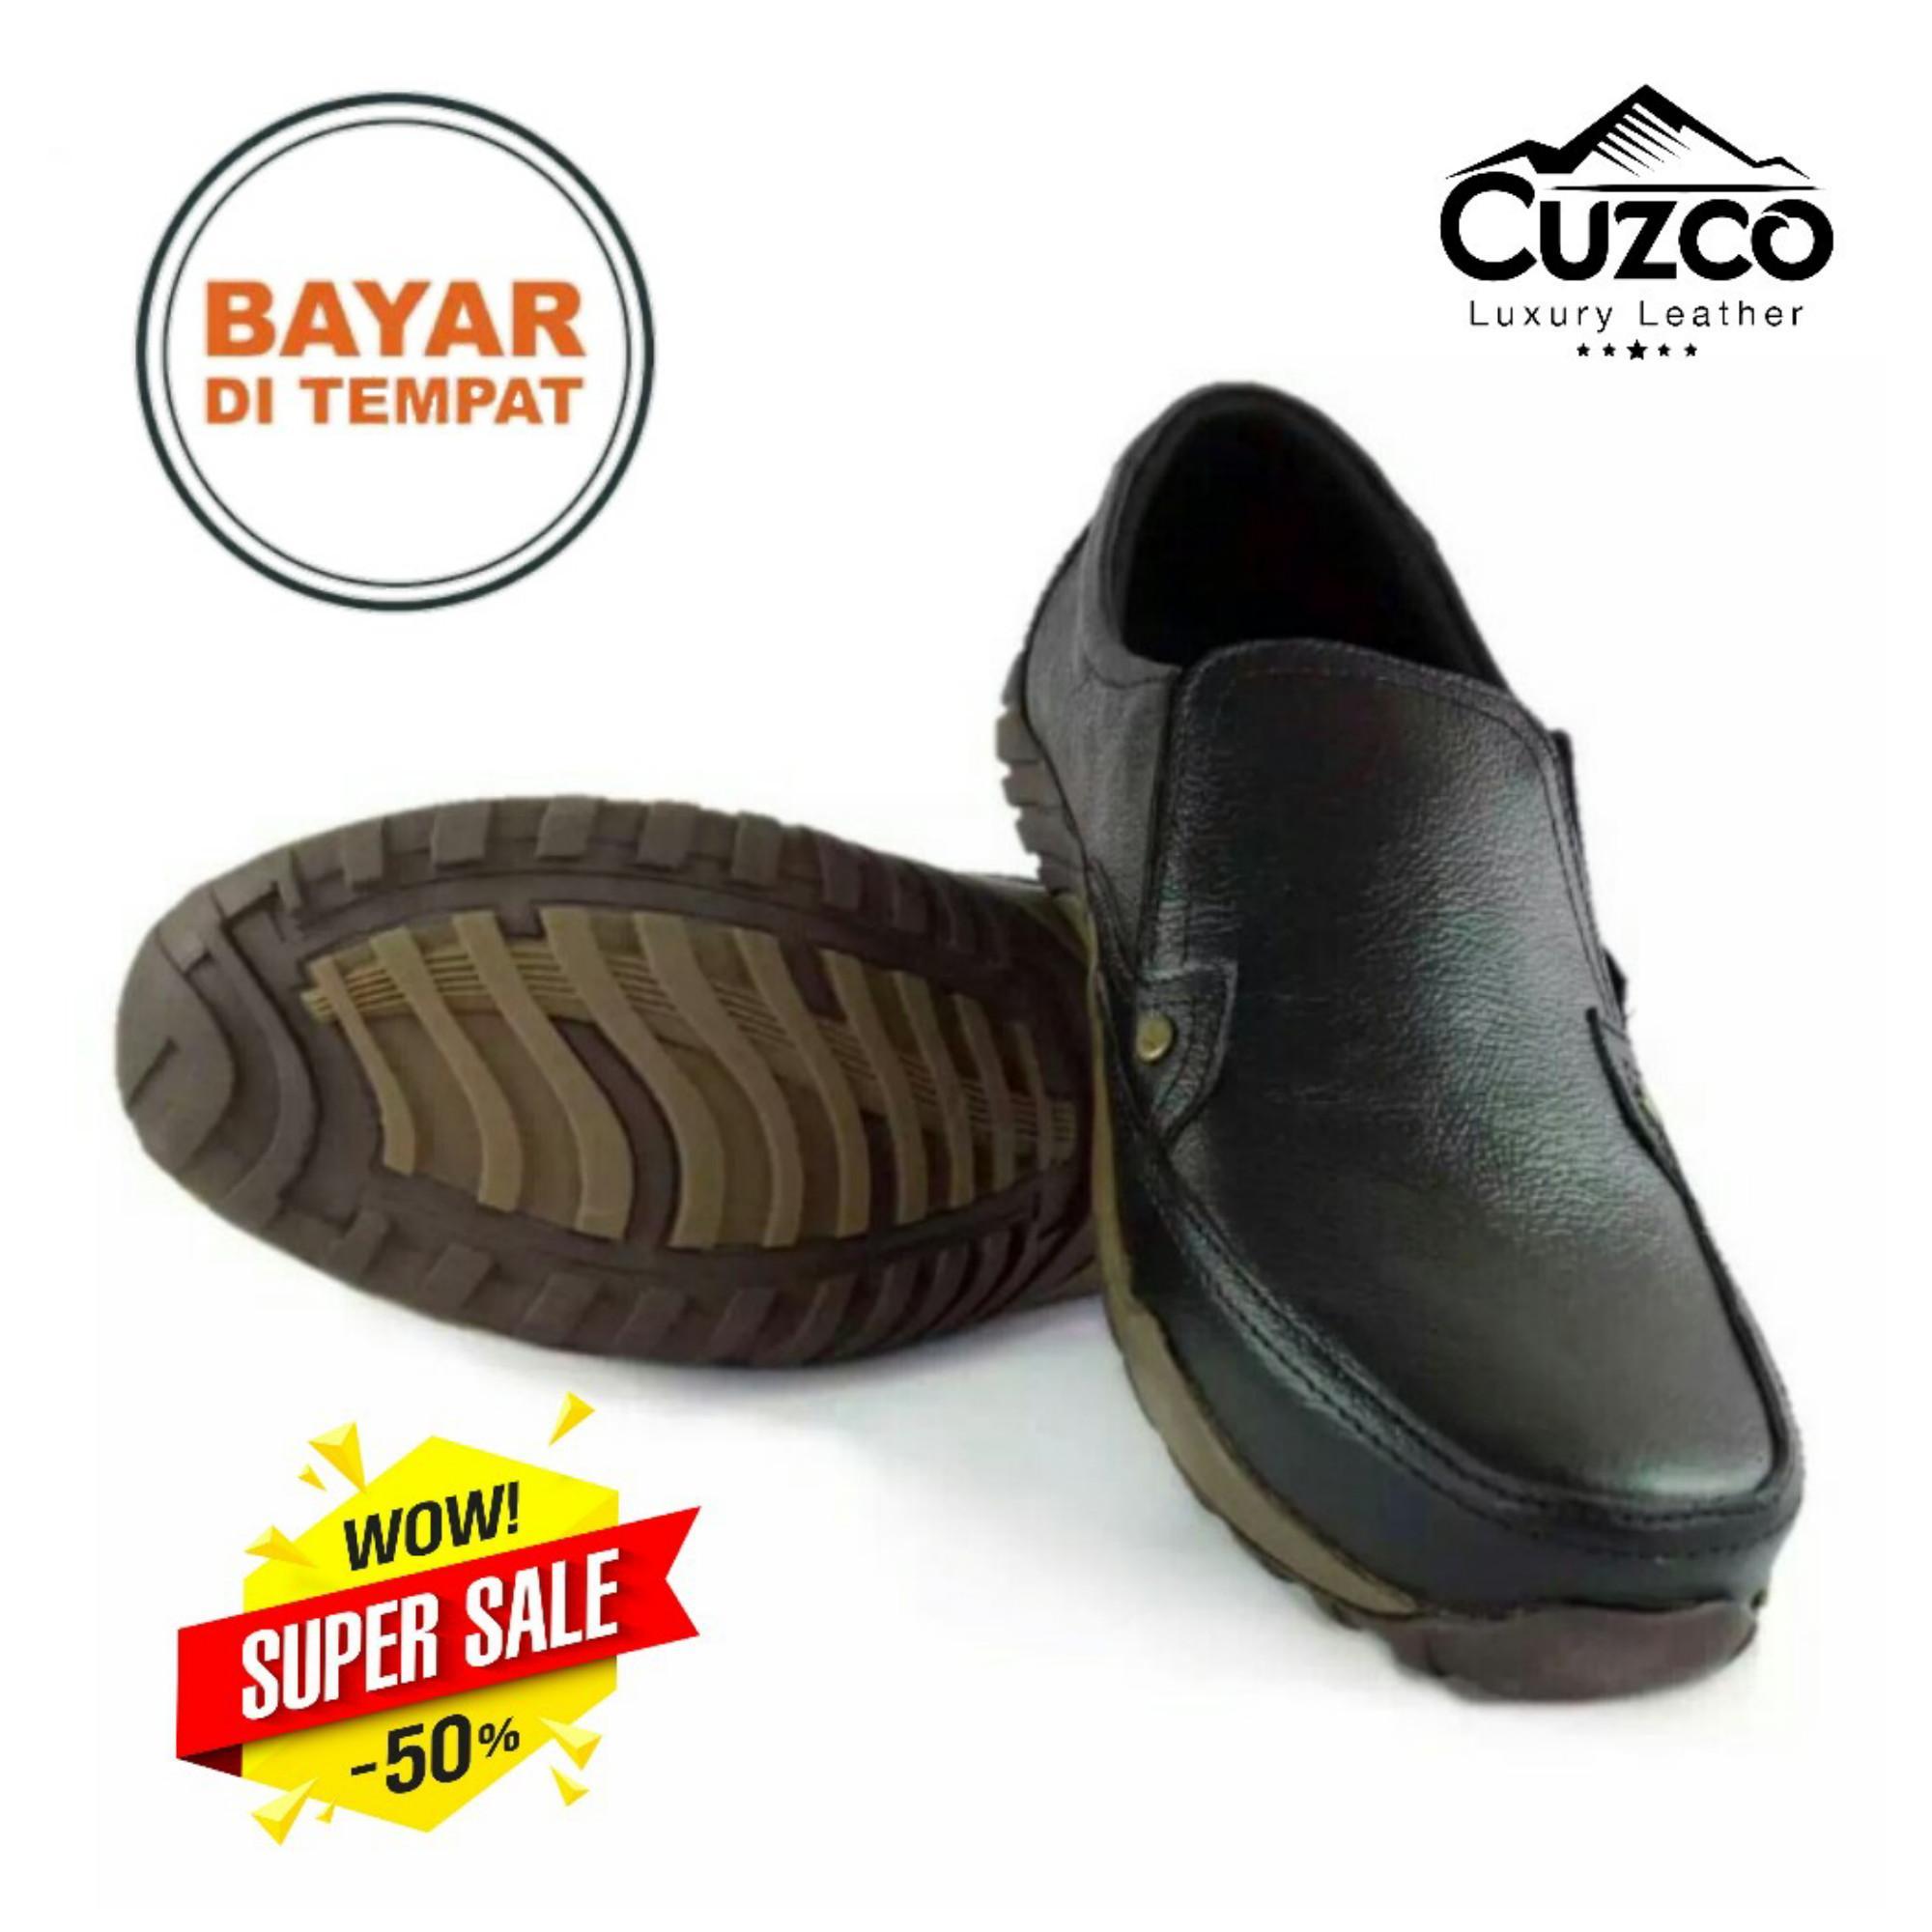 Sepatu Pria Kulit Asli Casual Formal / Sepatu Kulit Asli Pria Kasual / Sepatu Pria Kulit